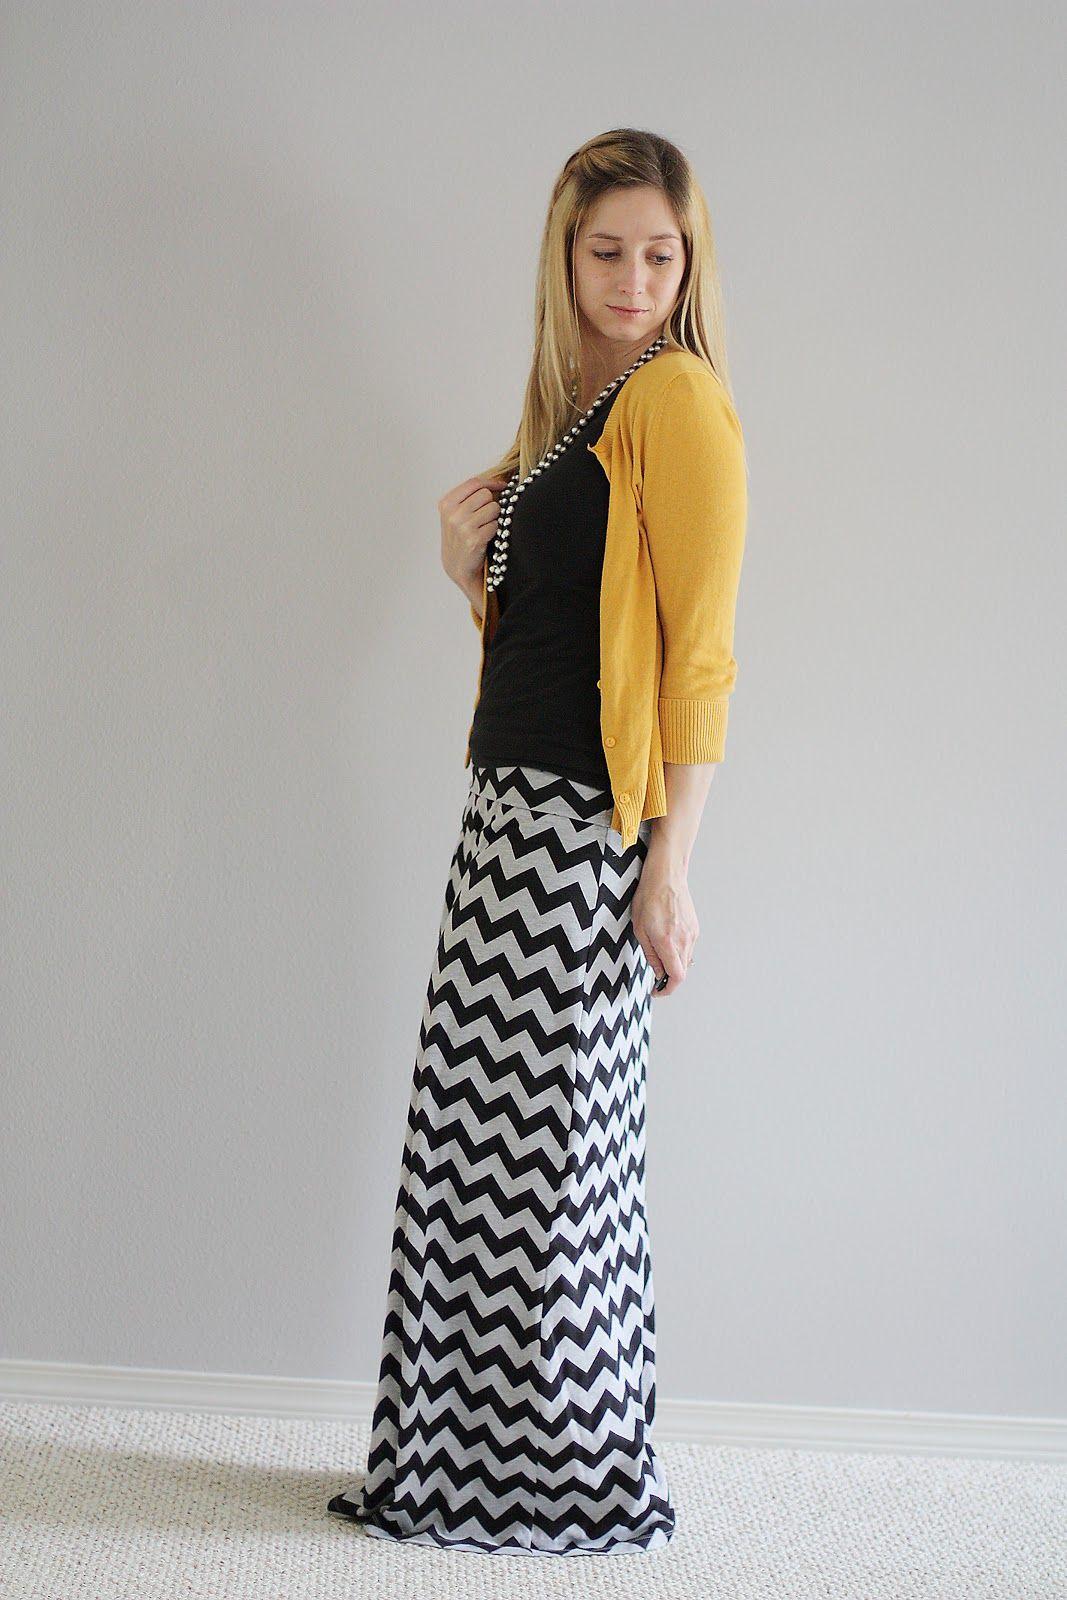 Comfy Chevron Maxi Skirt // Sew Much Ado - love love love this look ...